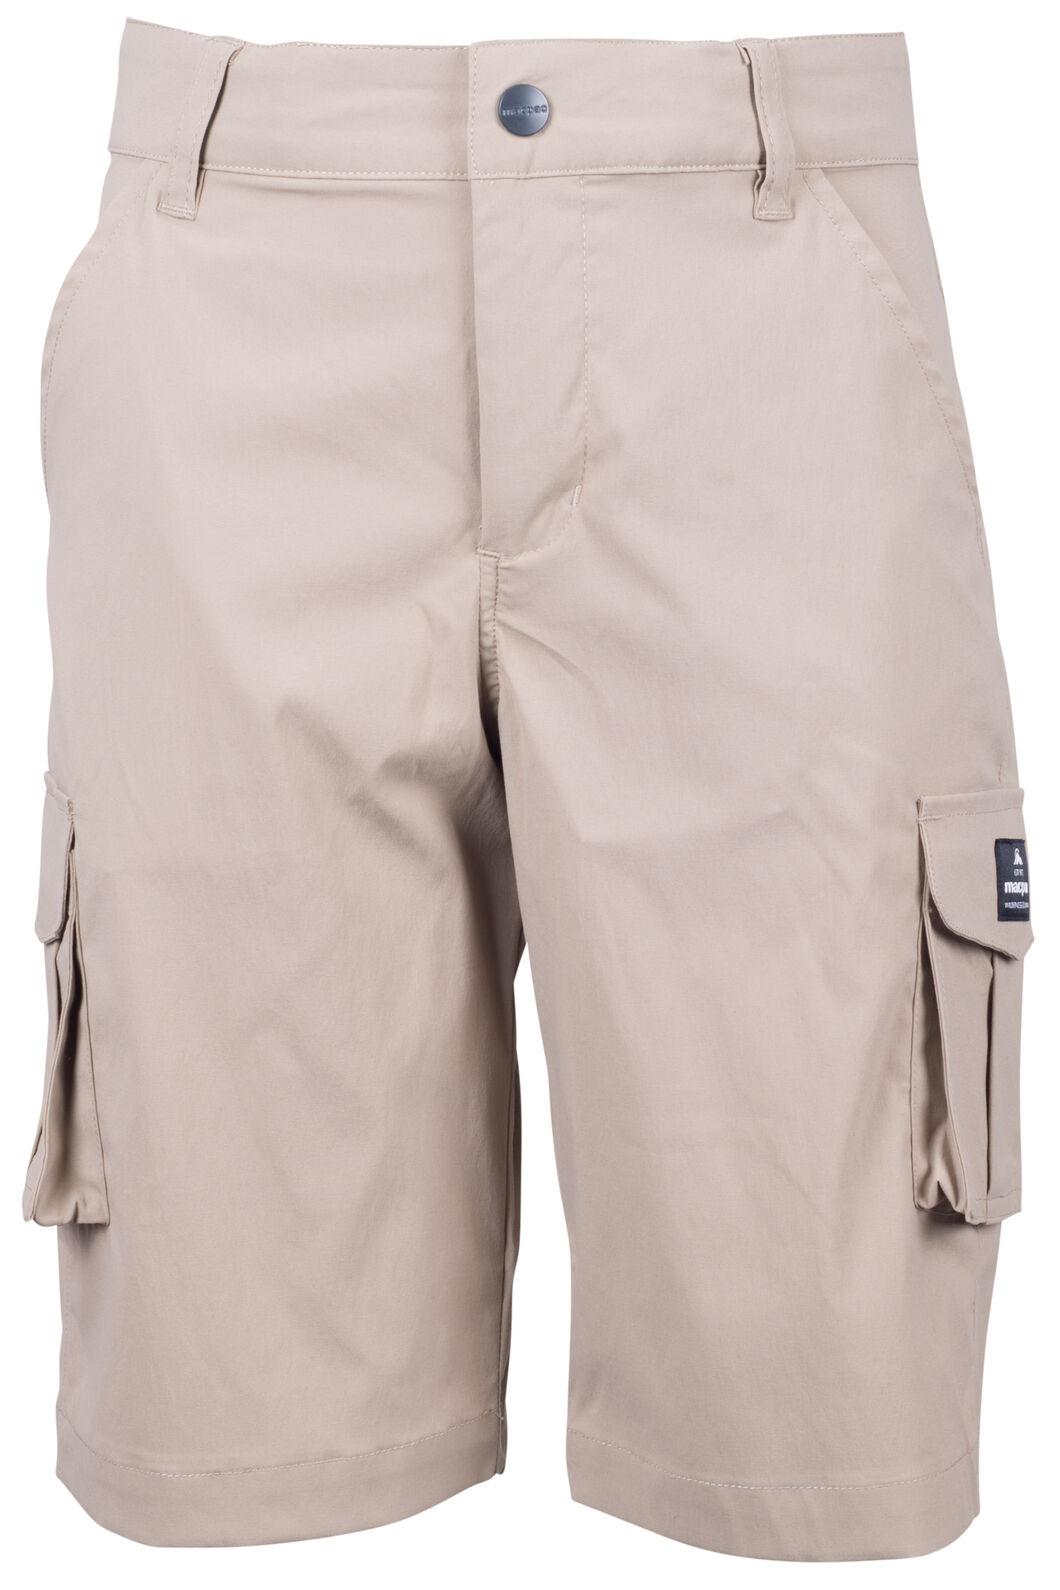 Macpac Lil Drifter Shorts - Kids', Chinchilla, hi-res